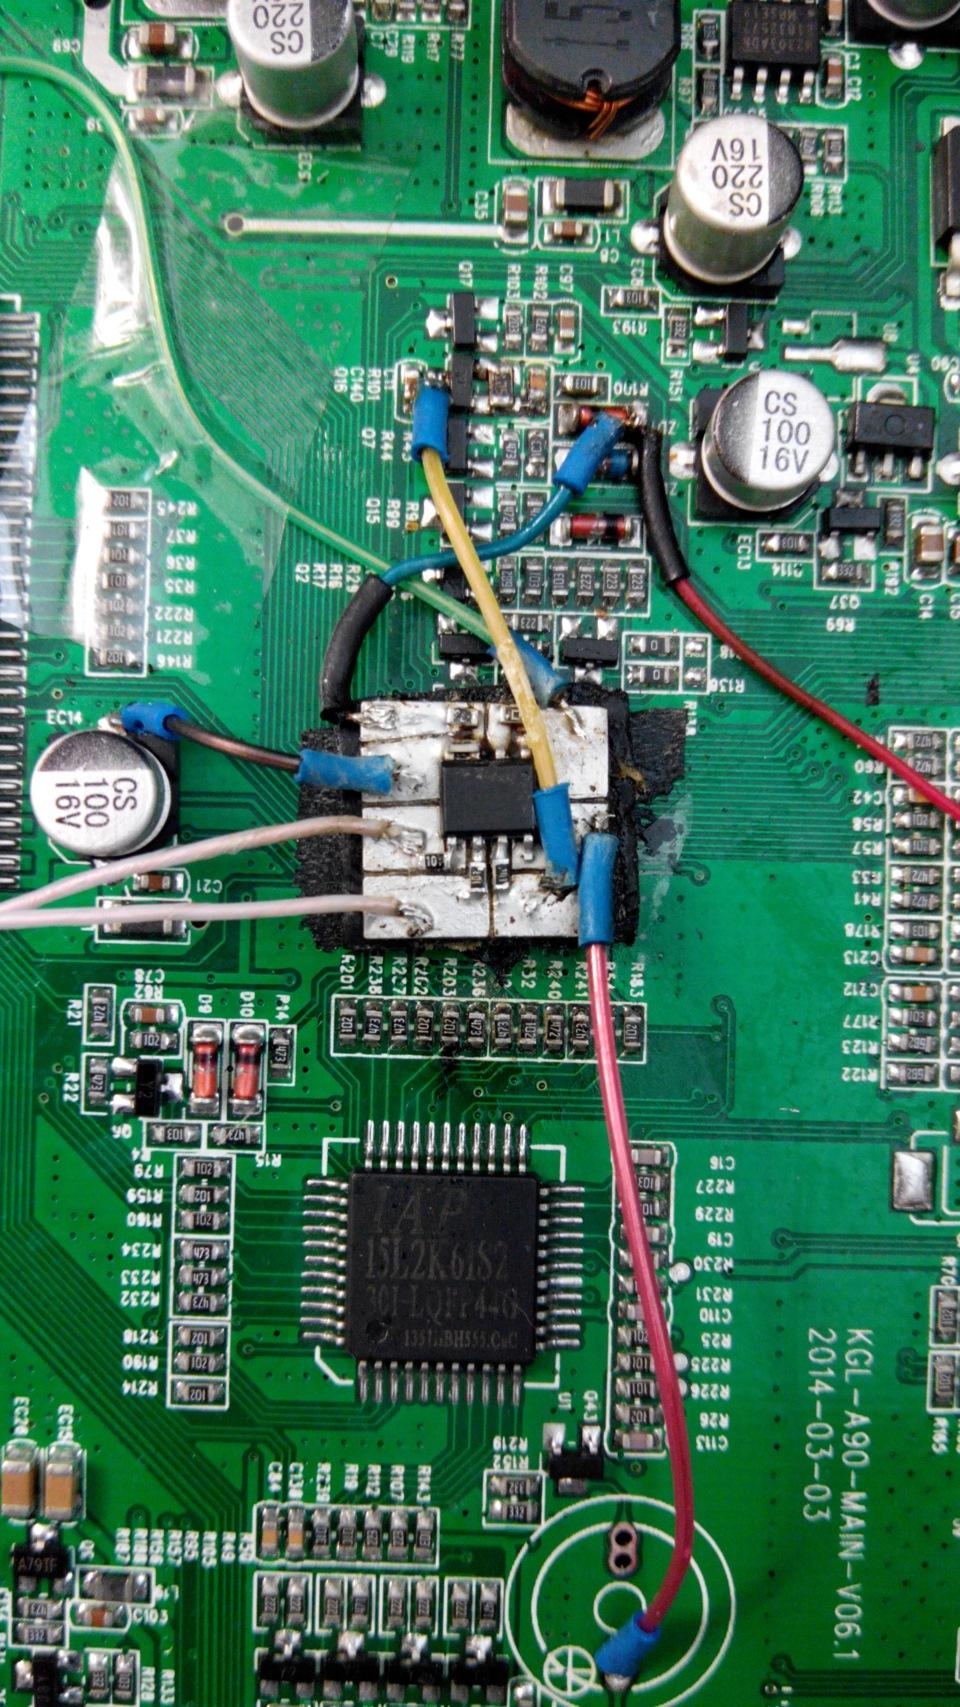 схема подключения автомагнитолы на хендай солярис